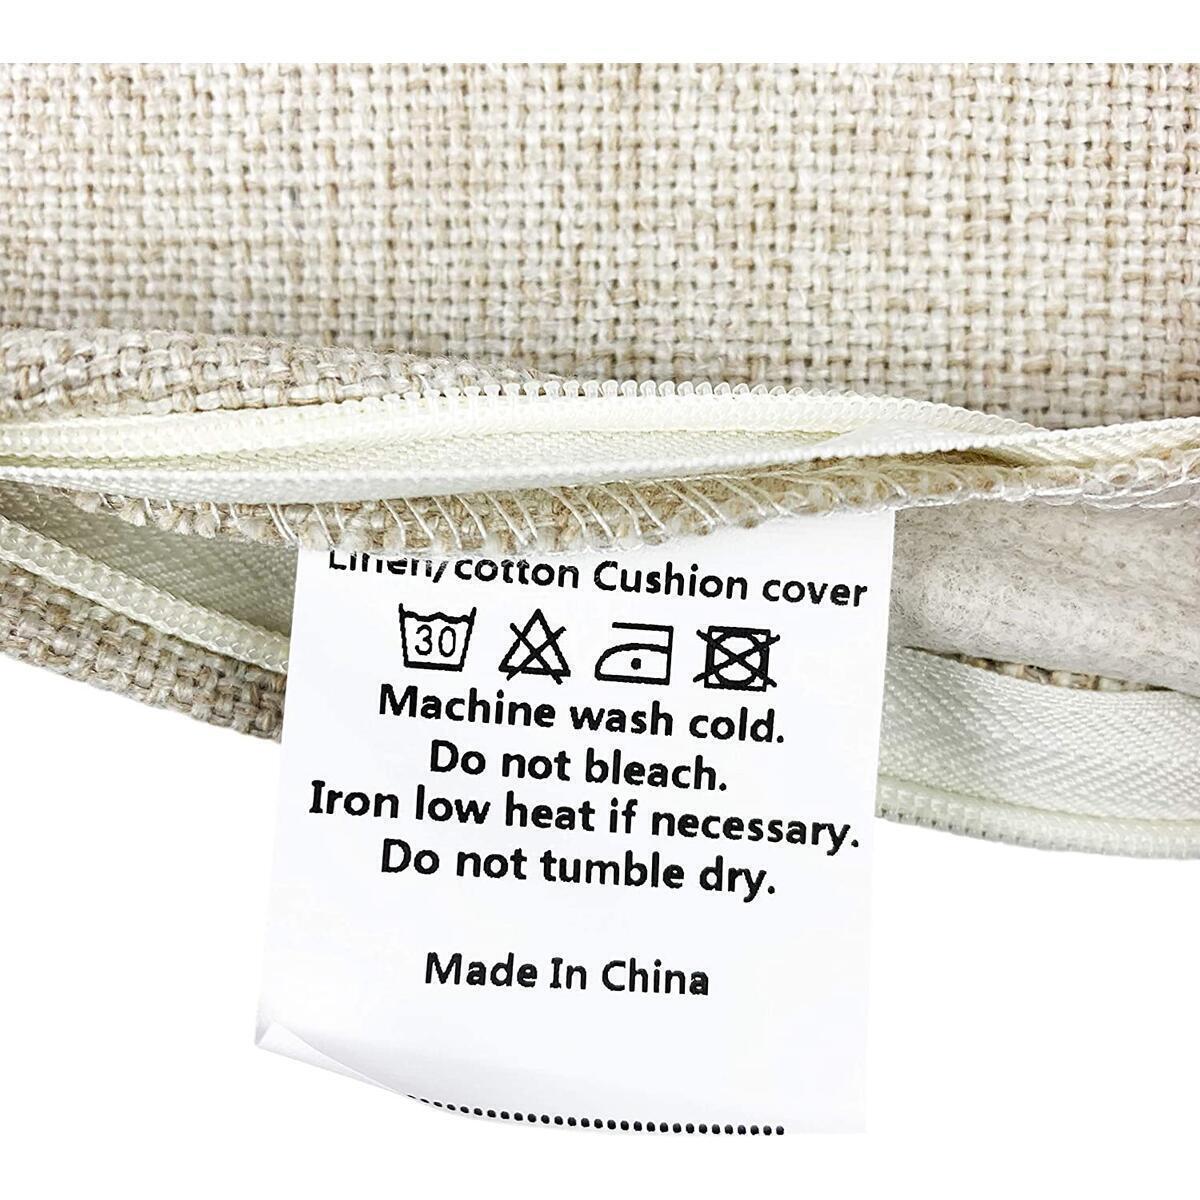 DrupsCo 18x18 Starfish Throw Pillow Cover for Couches - Sand Dollar Decor Pillow Cover, Cotton Linen Coastal Decor Beach Theme Pillow Cover